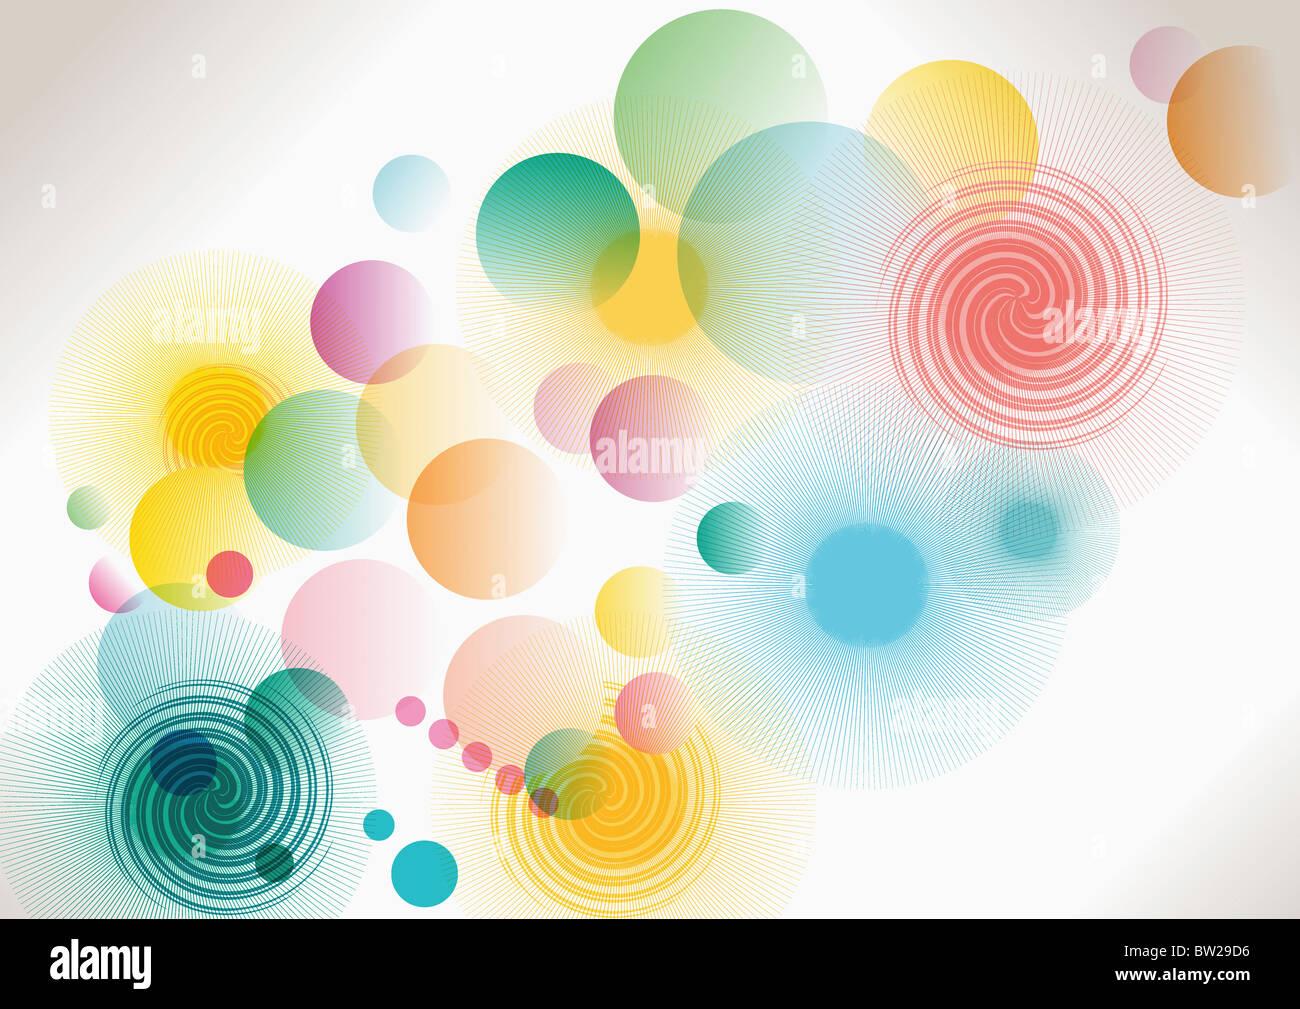 colorful circled pattern - Stock Image